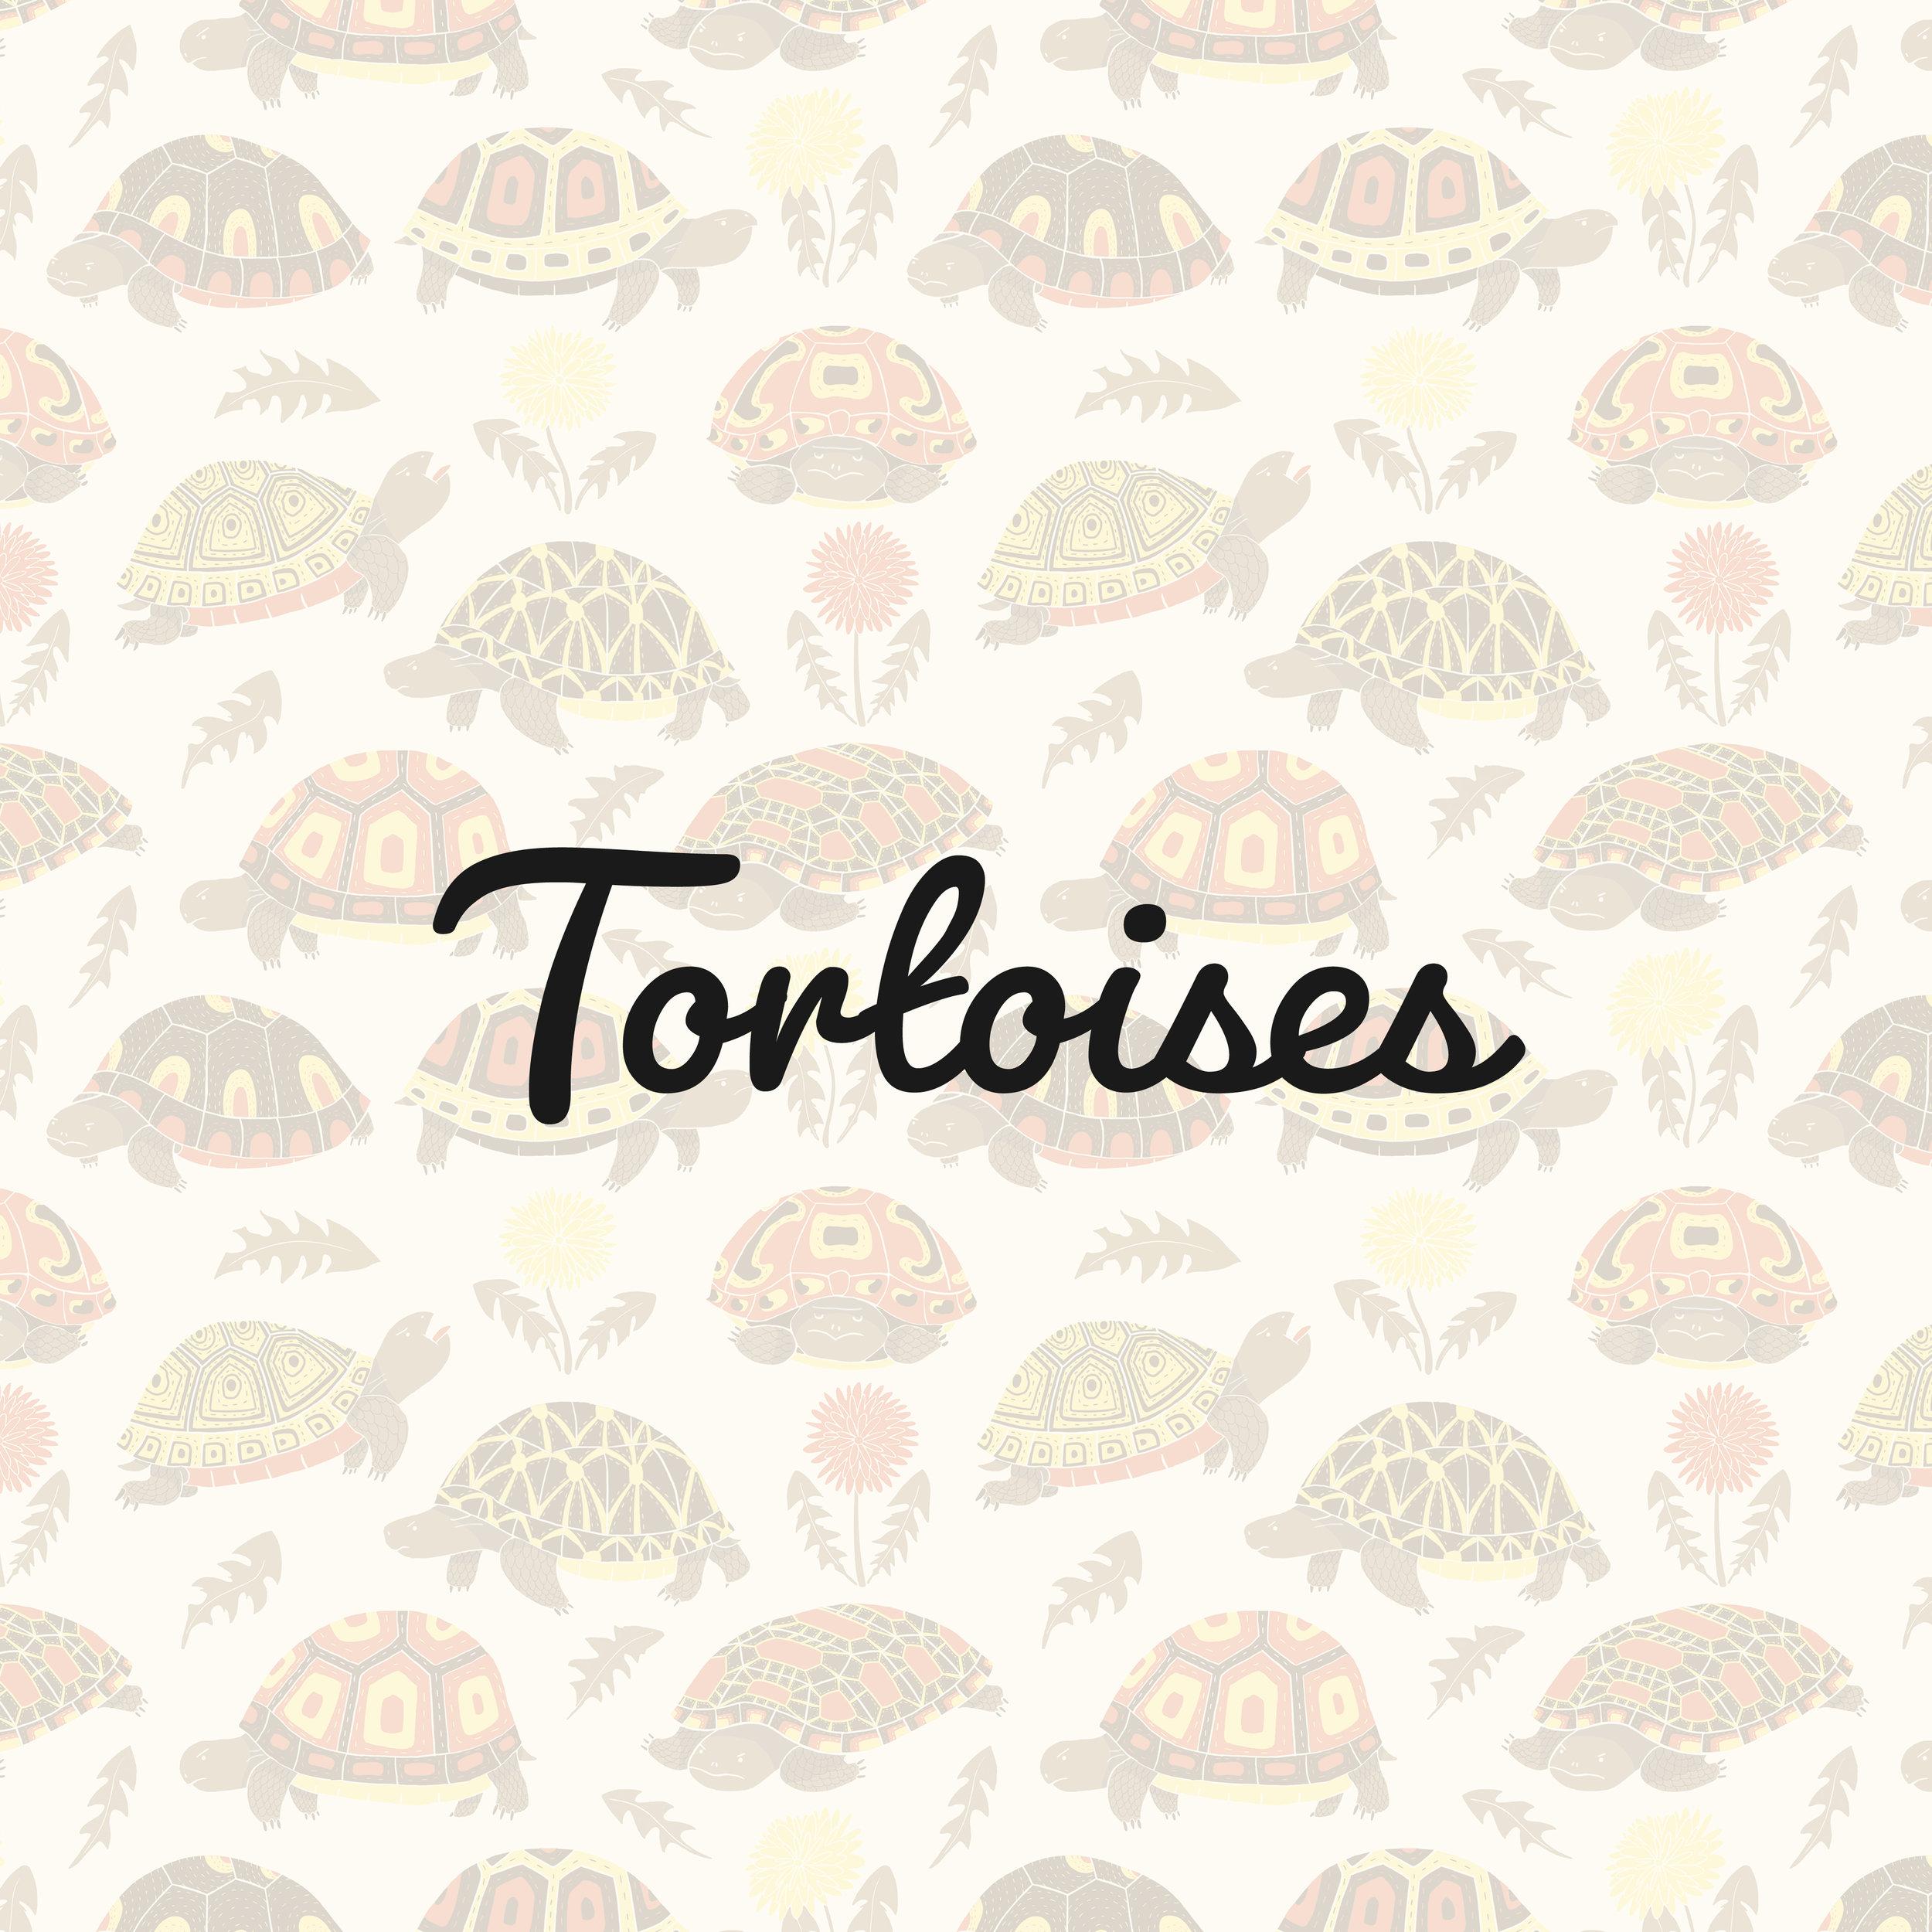 Torts_square.jpg